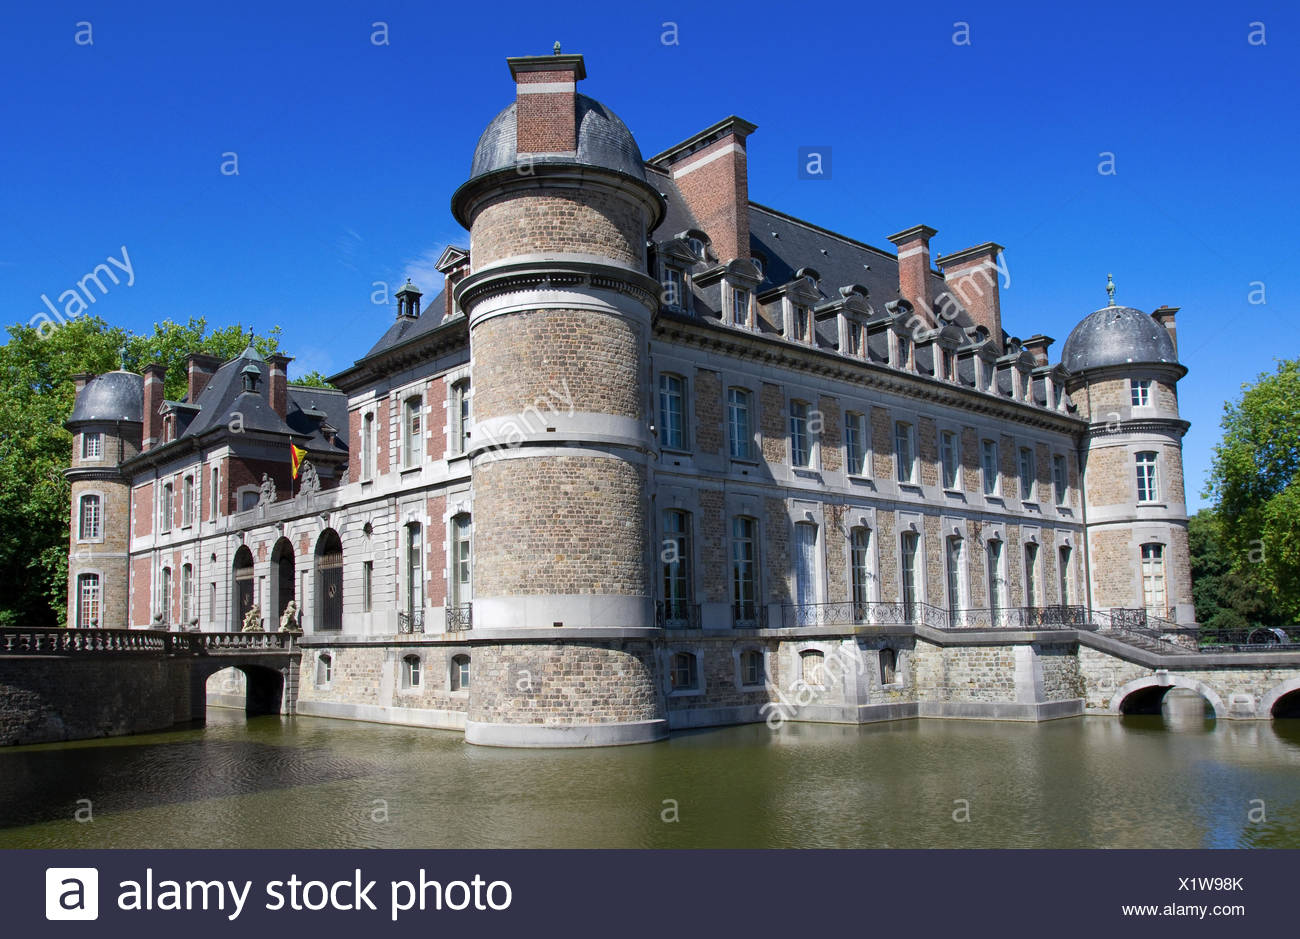 summer summerly belgium castle moat water chateau tree trees stone bridge - Stock Image